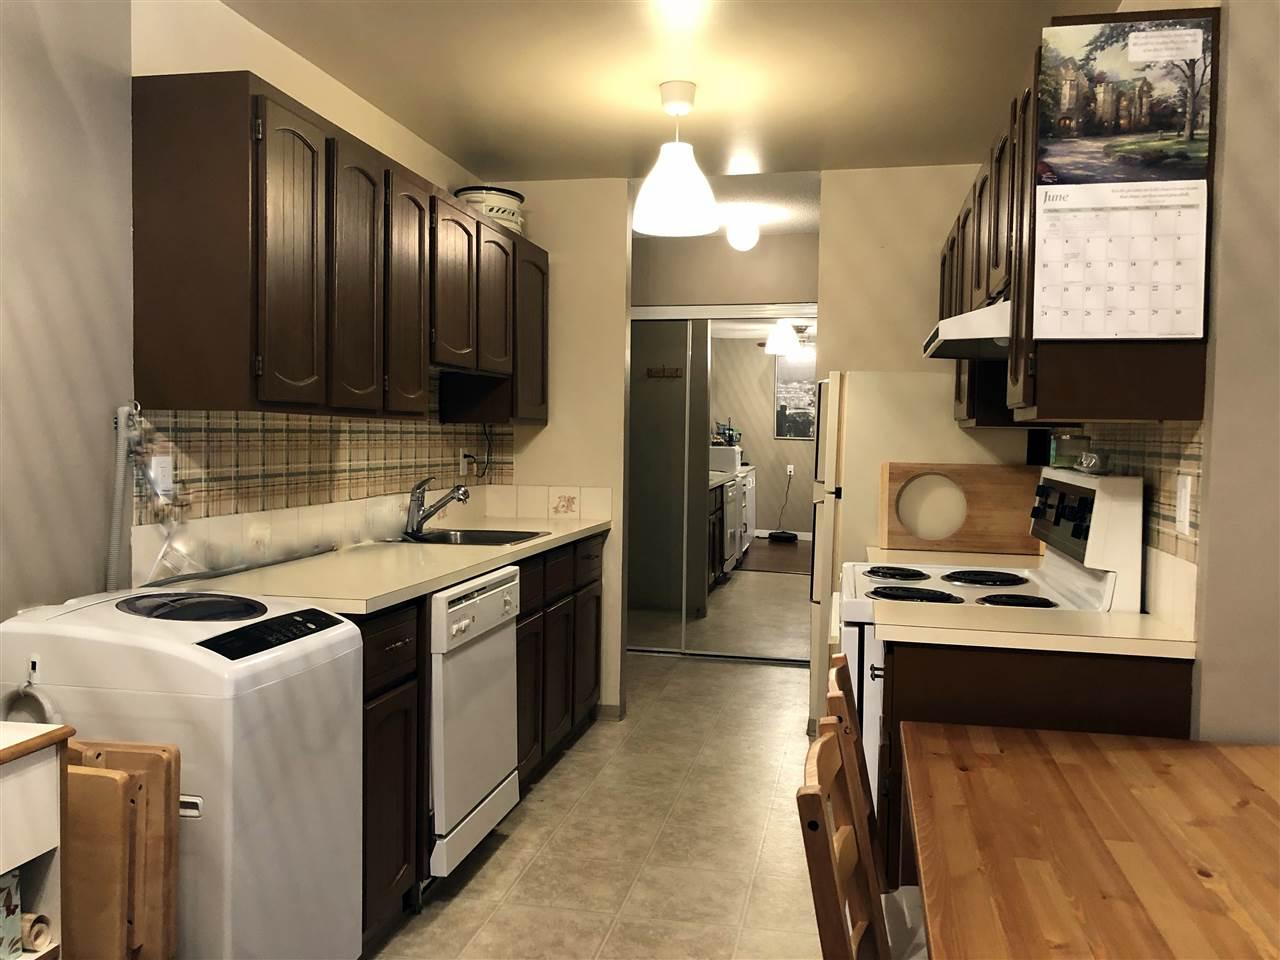 103 3611 145 Avenue, 2 bed, 1 bath, at $114,000